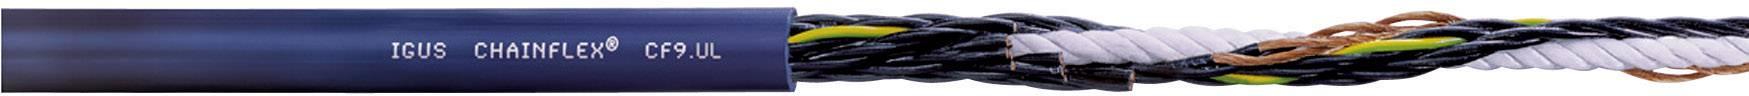 Řídicí kabelové vedení igus Chainflex® CF9.02.03.INI, 3x 0,25 mm², Ø 4 mm, 1 m, modrá